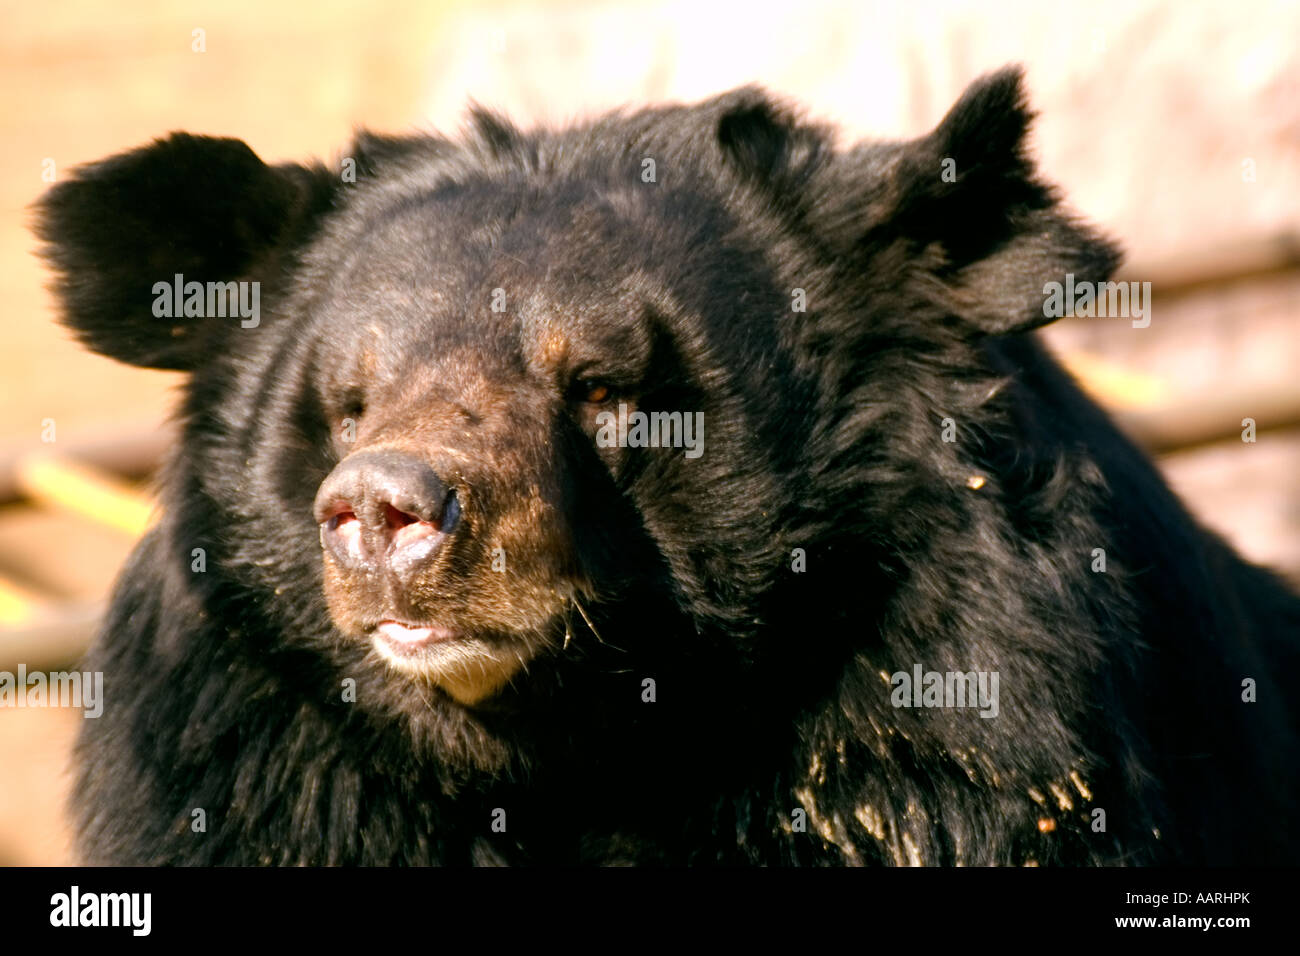 Asiatic black bear Selenarctos thibetanus in a zoo near Badaling China - Stock Image